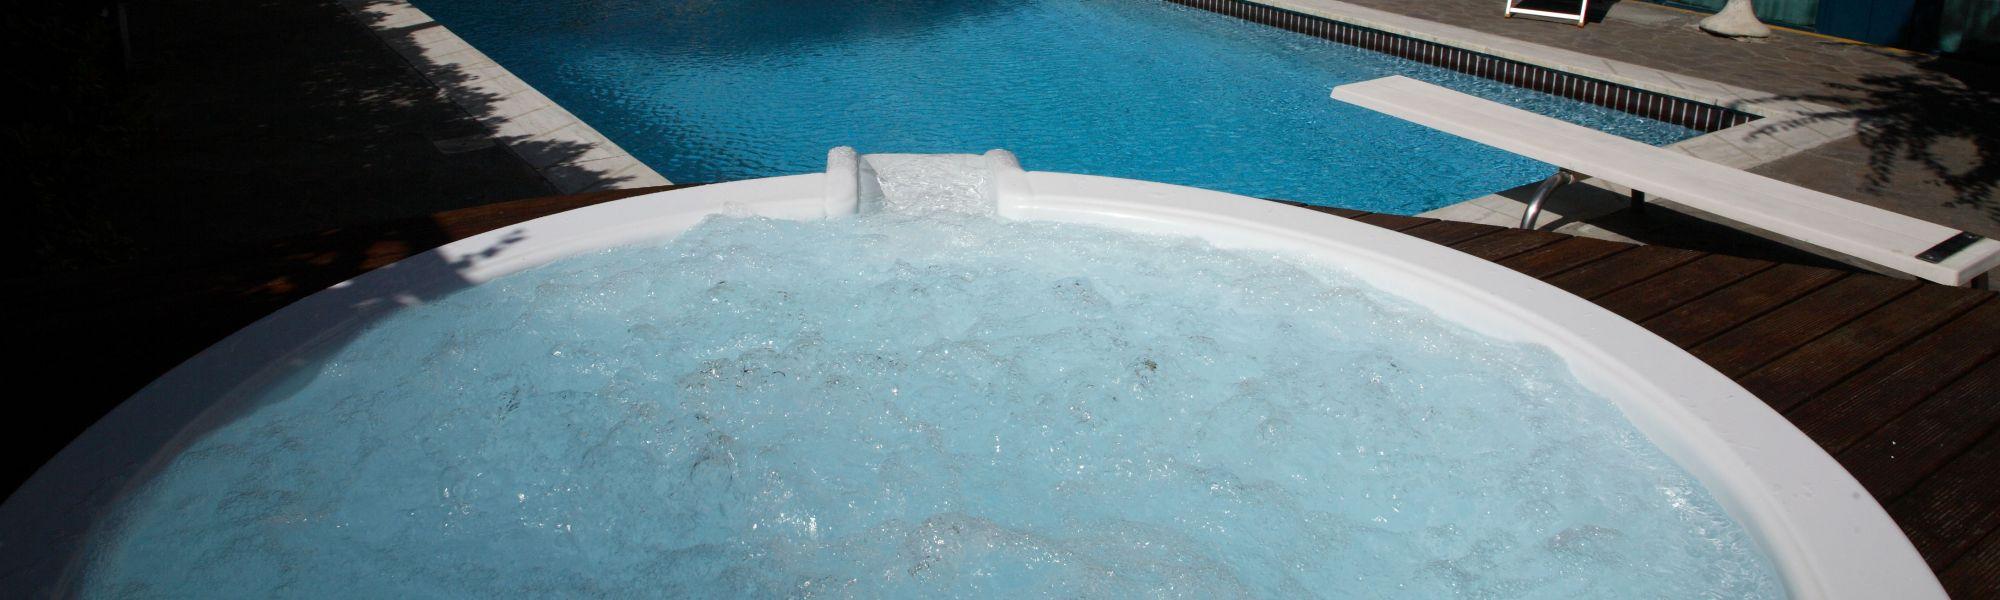 hotel avec piscine rimini hotel piscine pour vacances hotel aristeo hotel aristeo rimini. Black Bedroom Furniture Sets. Home Design Ideas